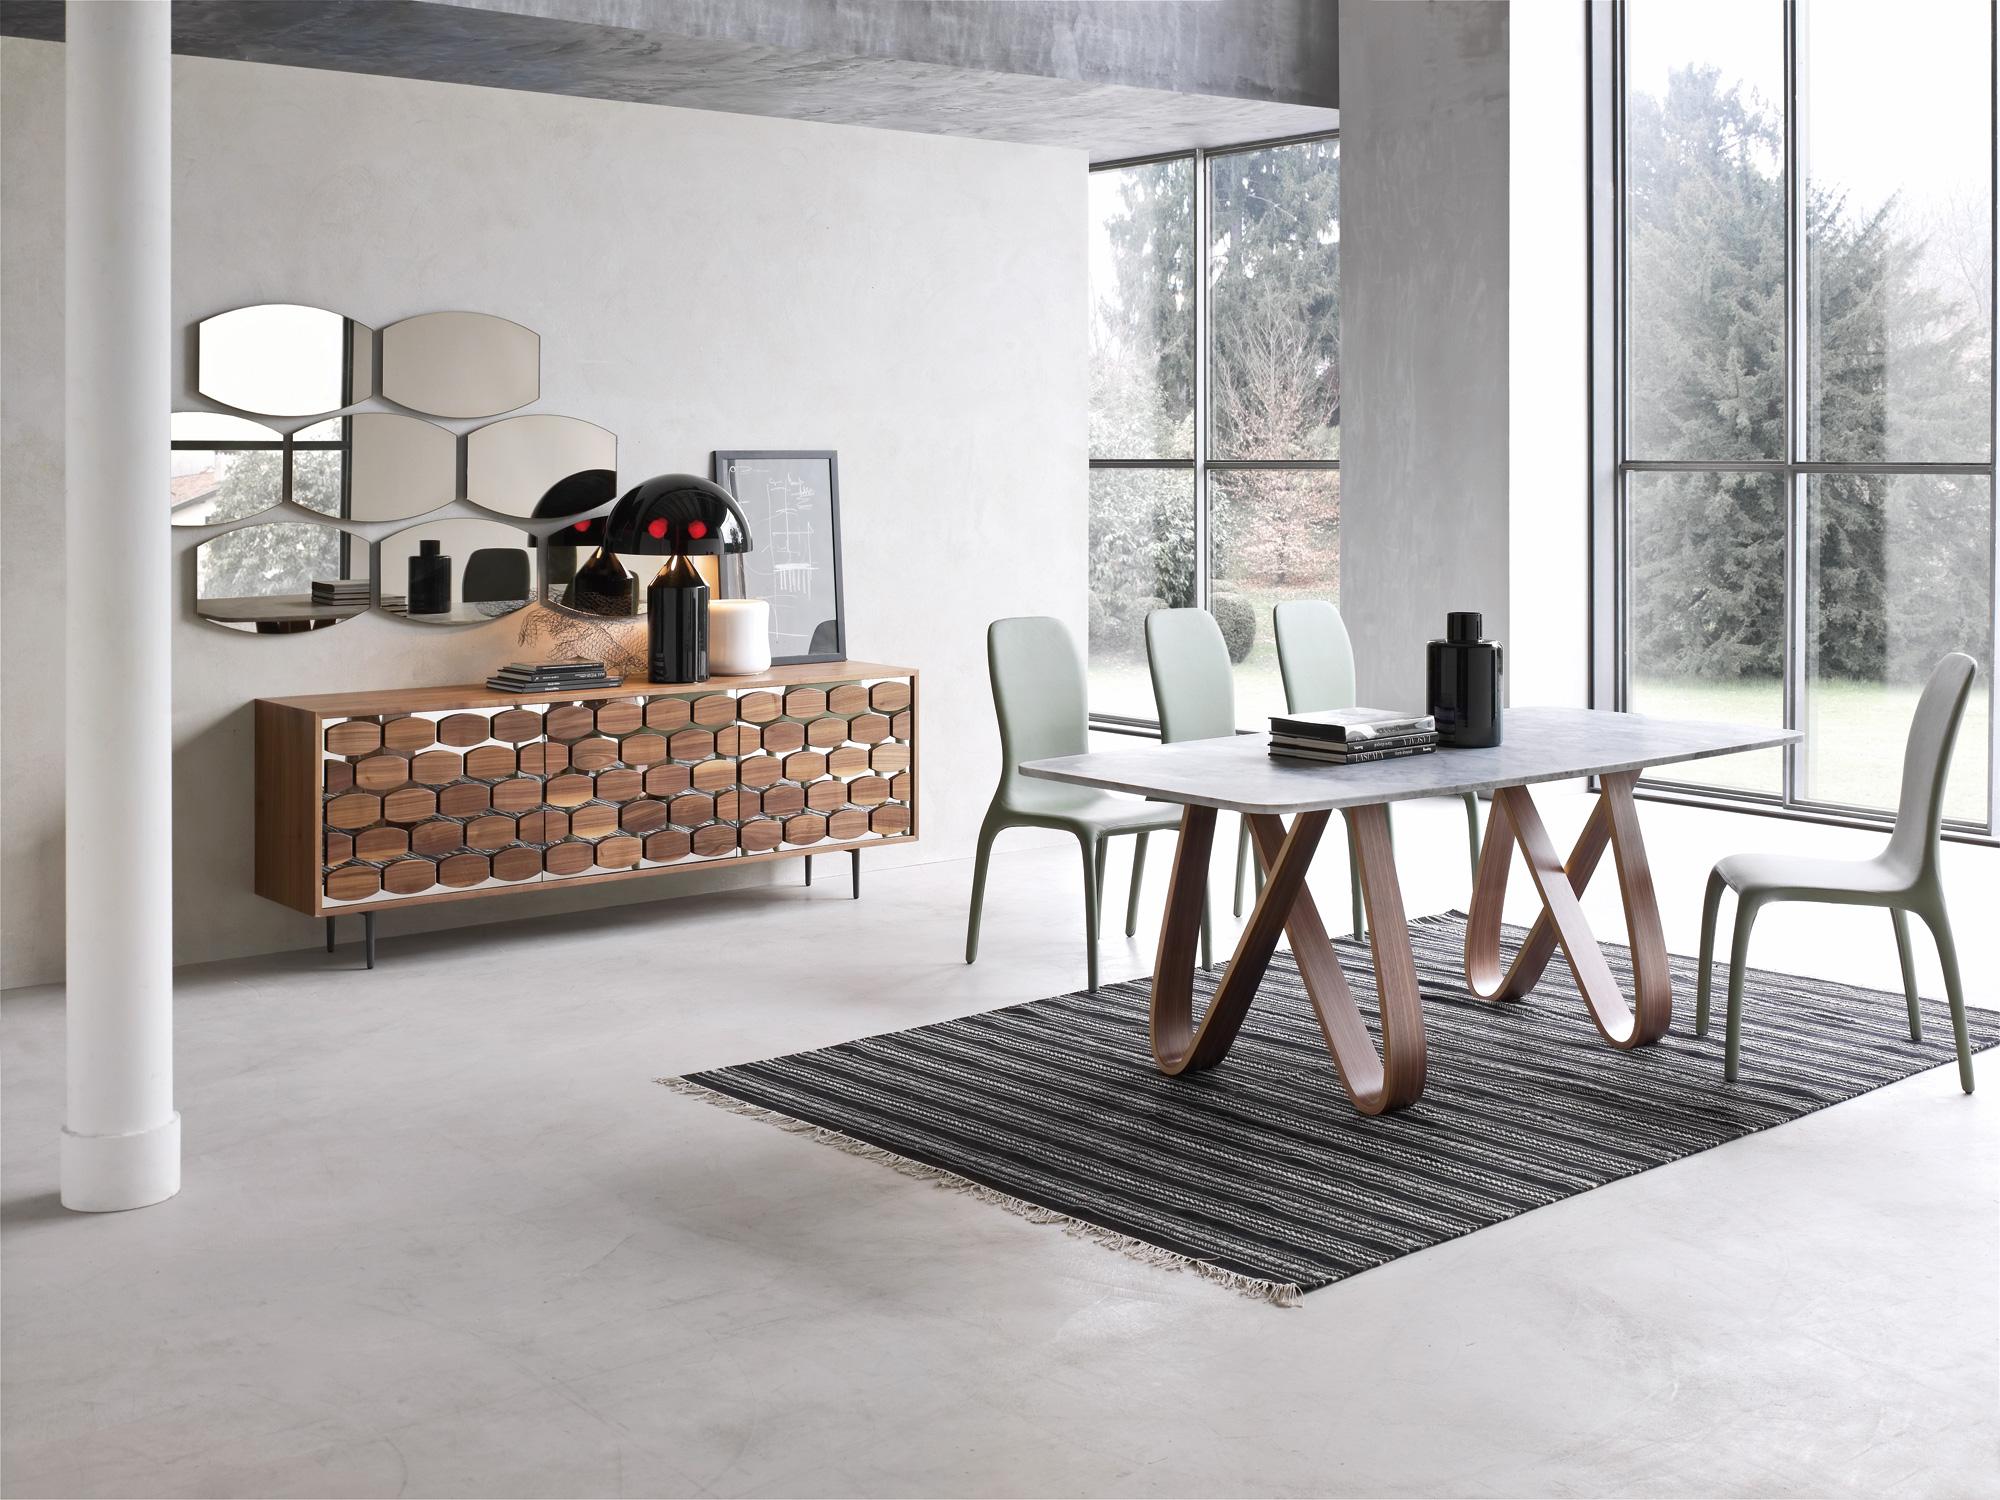 Tonin casa honey 6113 mobile singolo - Tavolo riflessi living prezzo ...